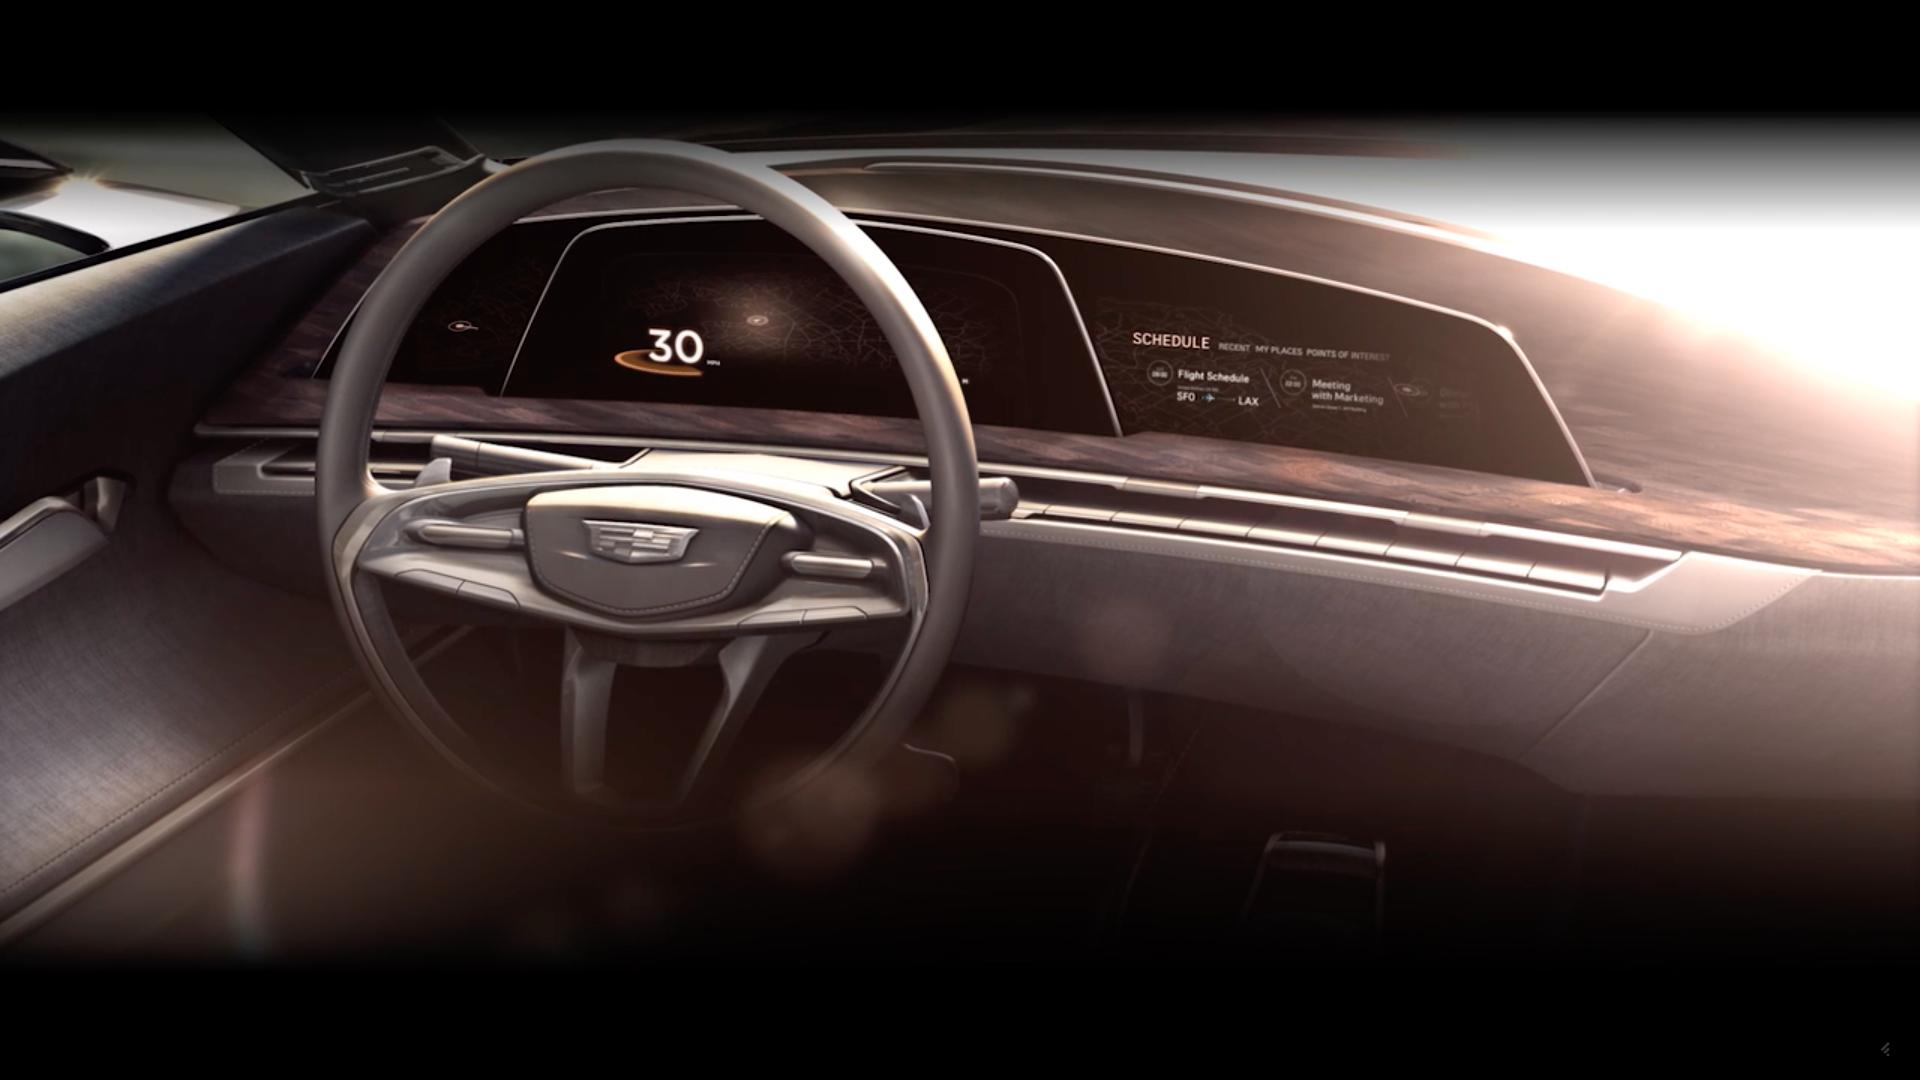 Cadillac Oled Virtual Dashboard Concept Teaser